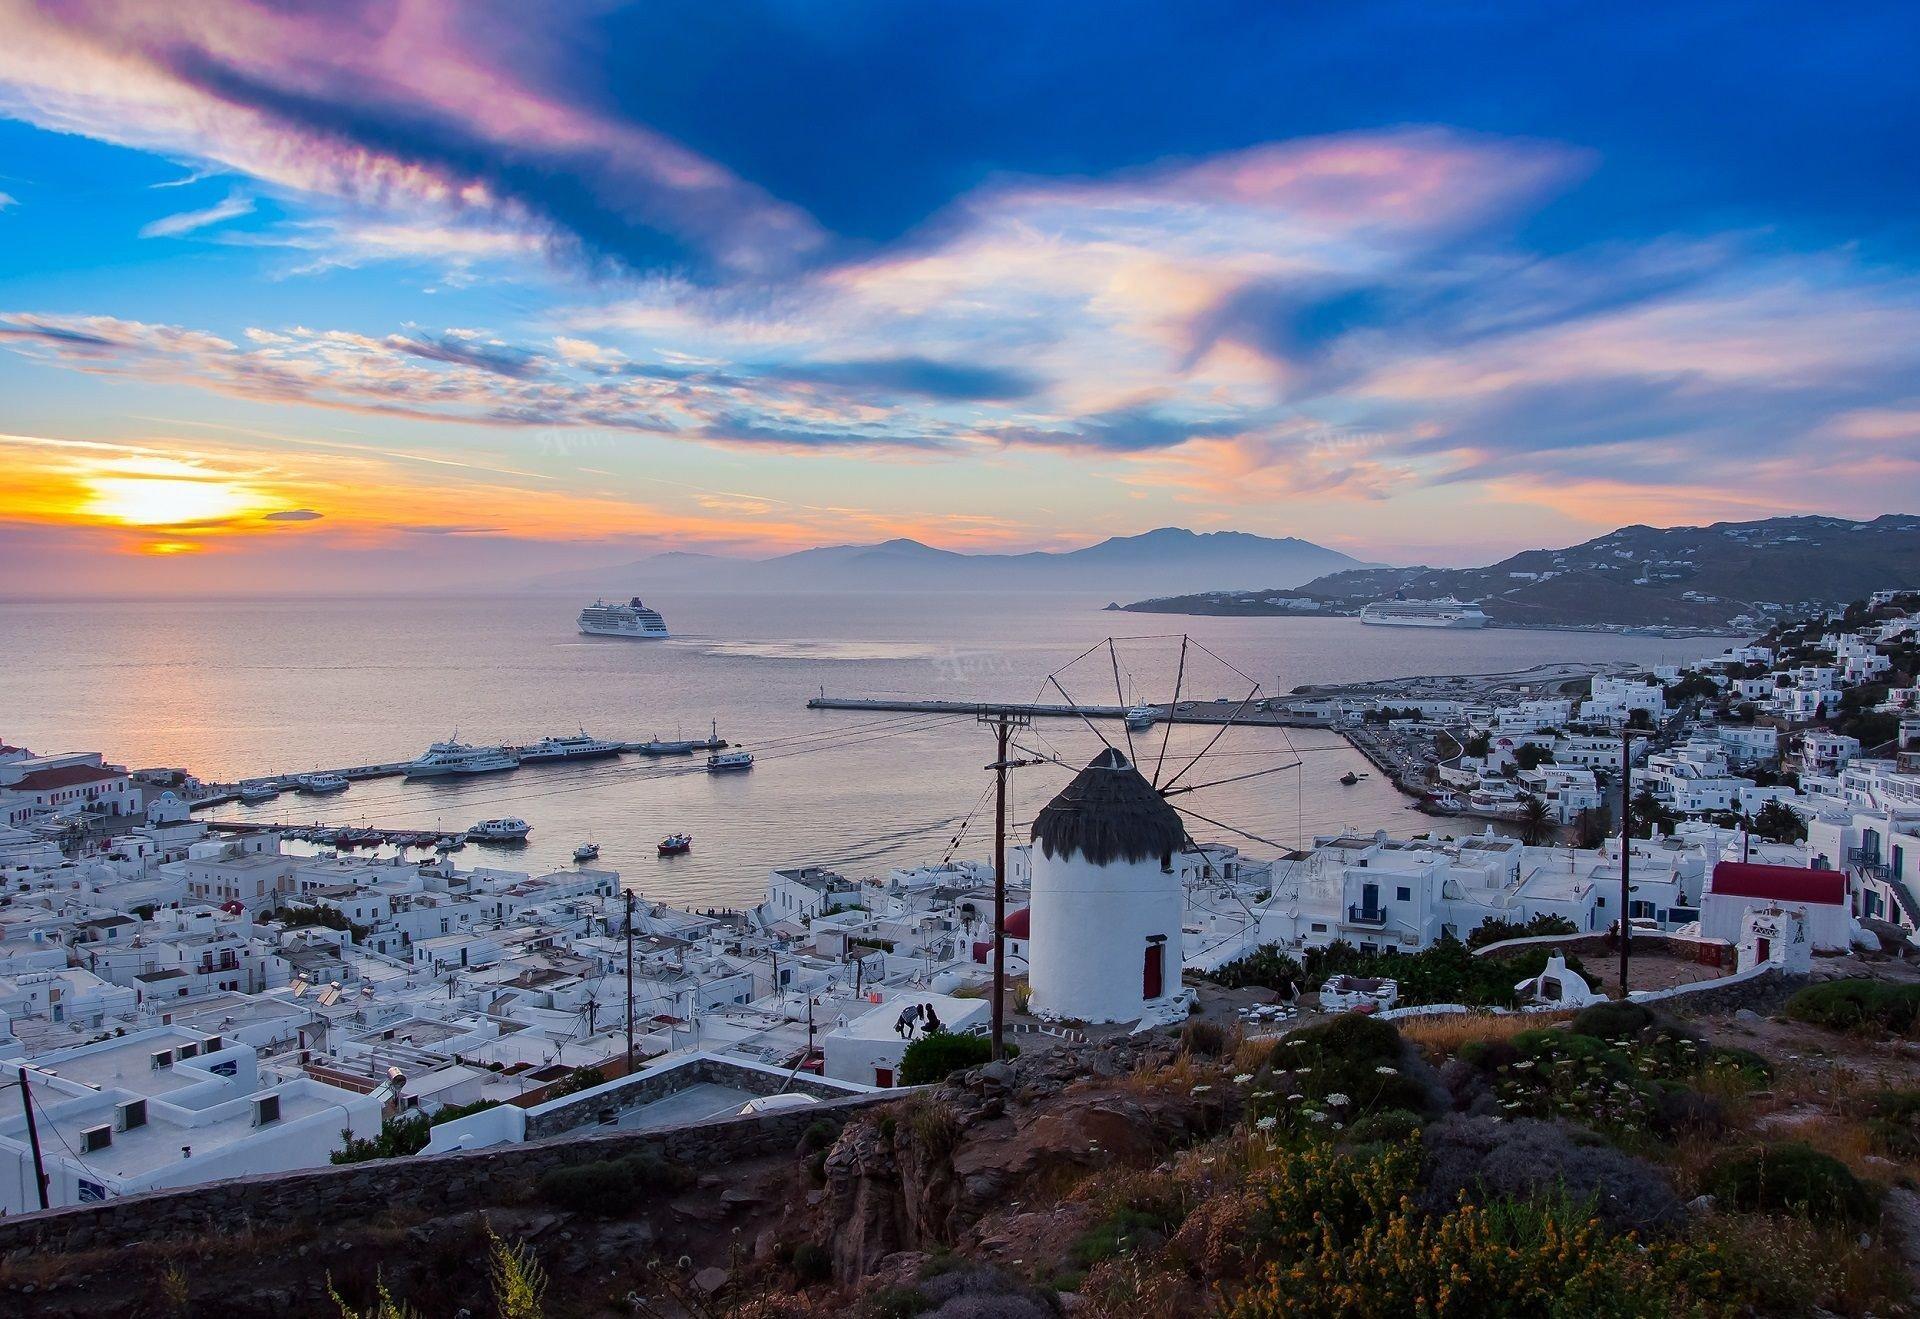 Sunset In Mykonos Island